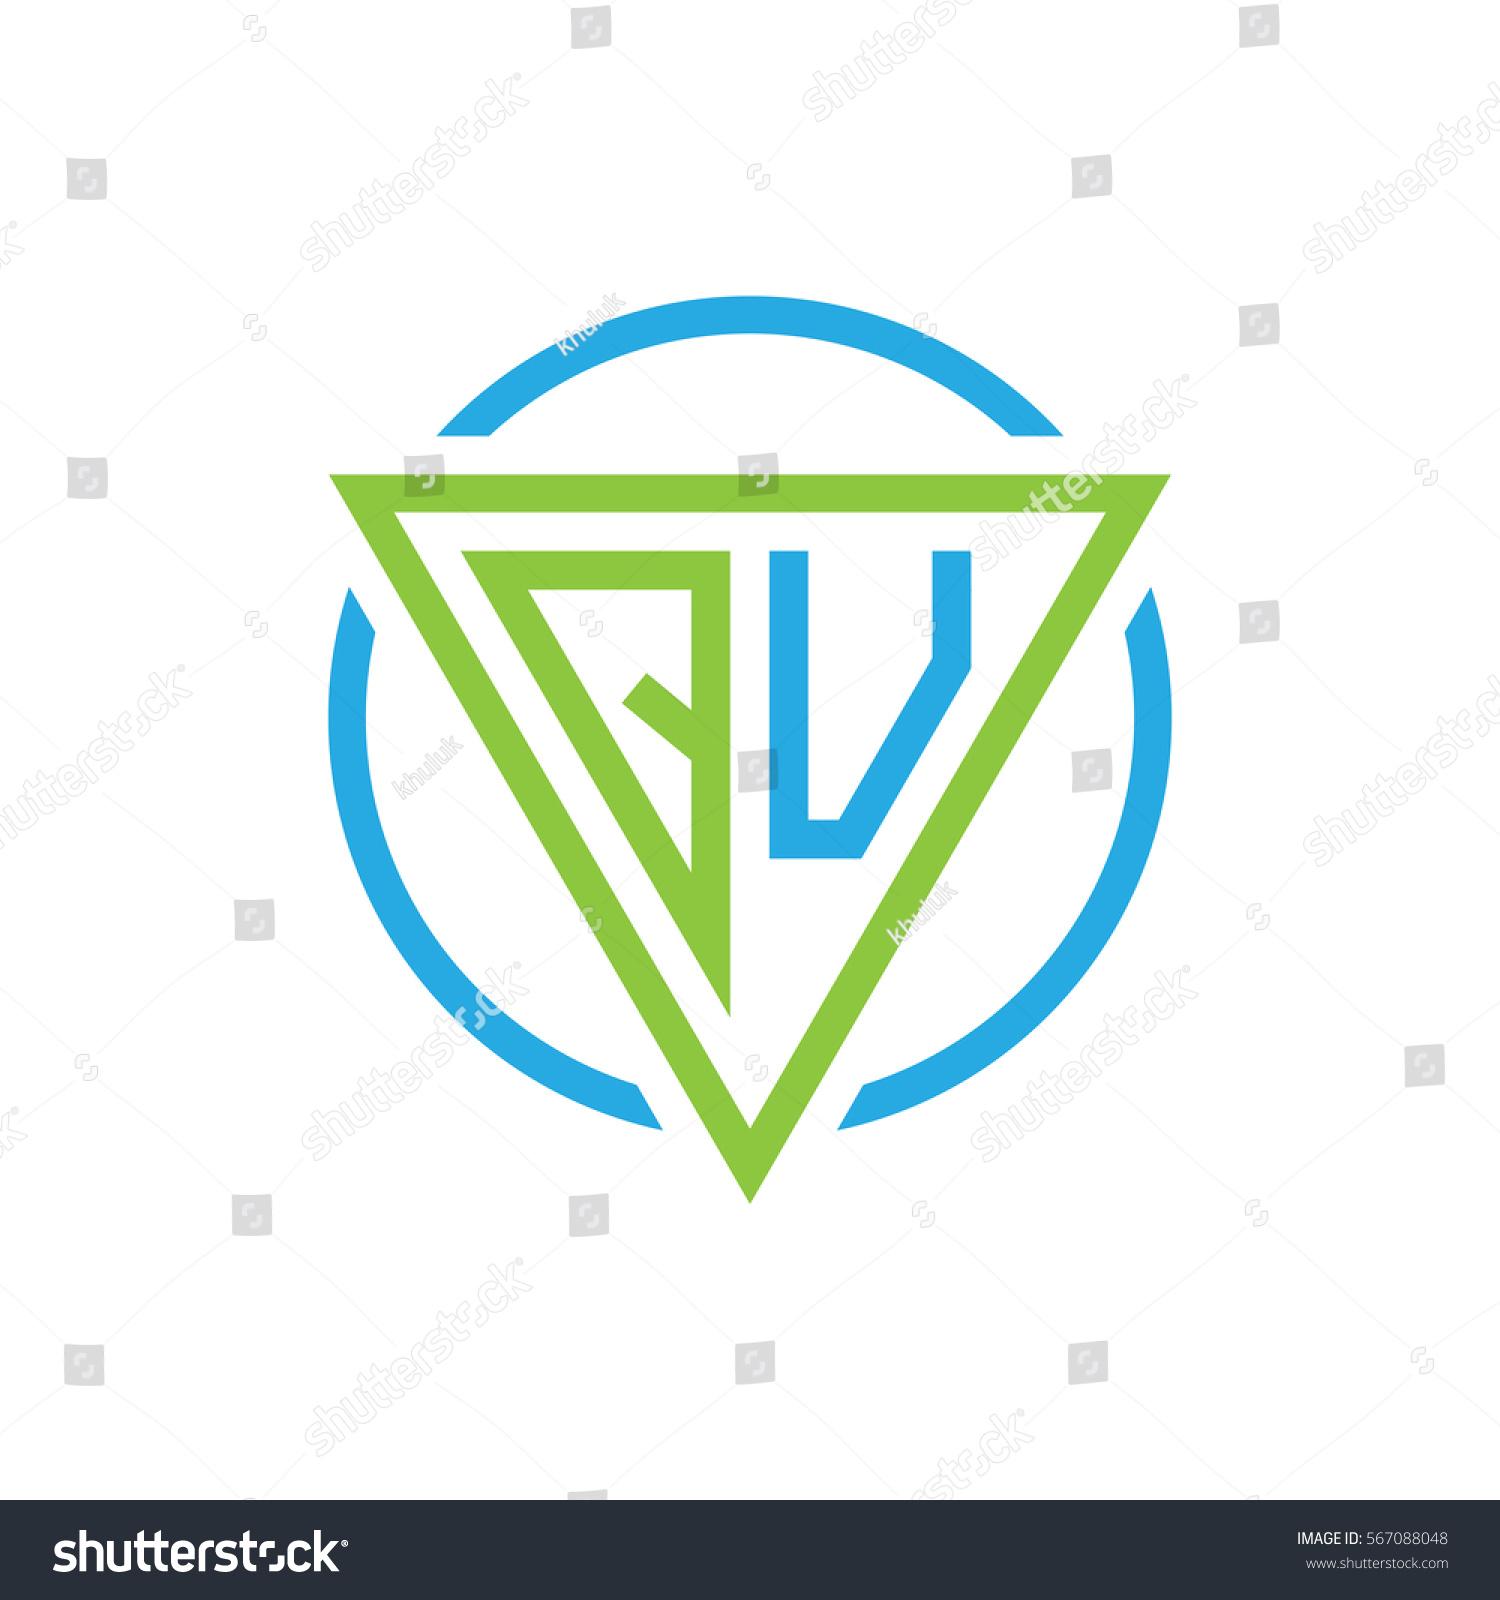 Initial letter logo triangle circle blue stock vector 567088048 initial letter logo triangle circle blue green buycottarizona